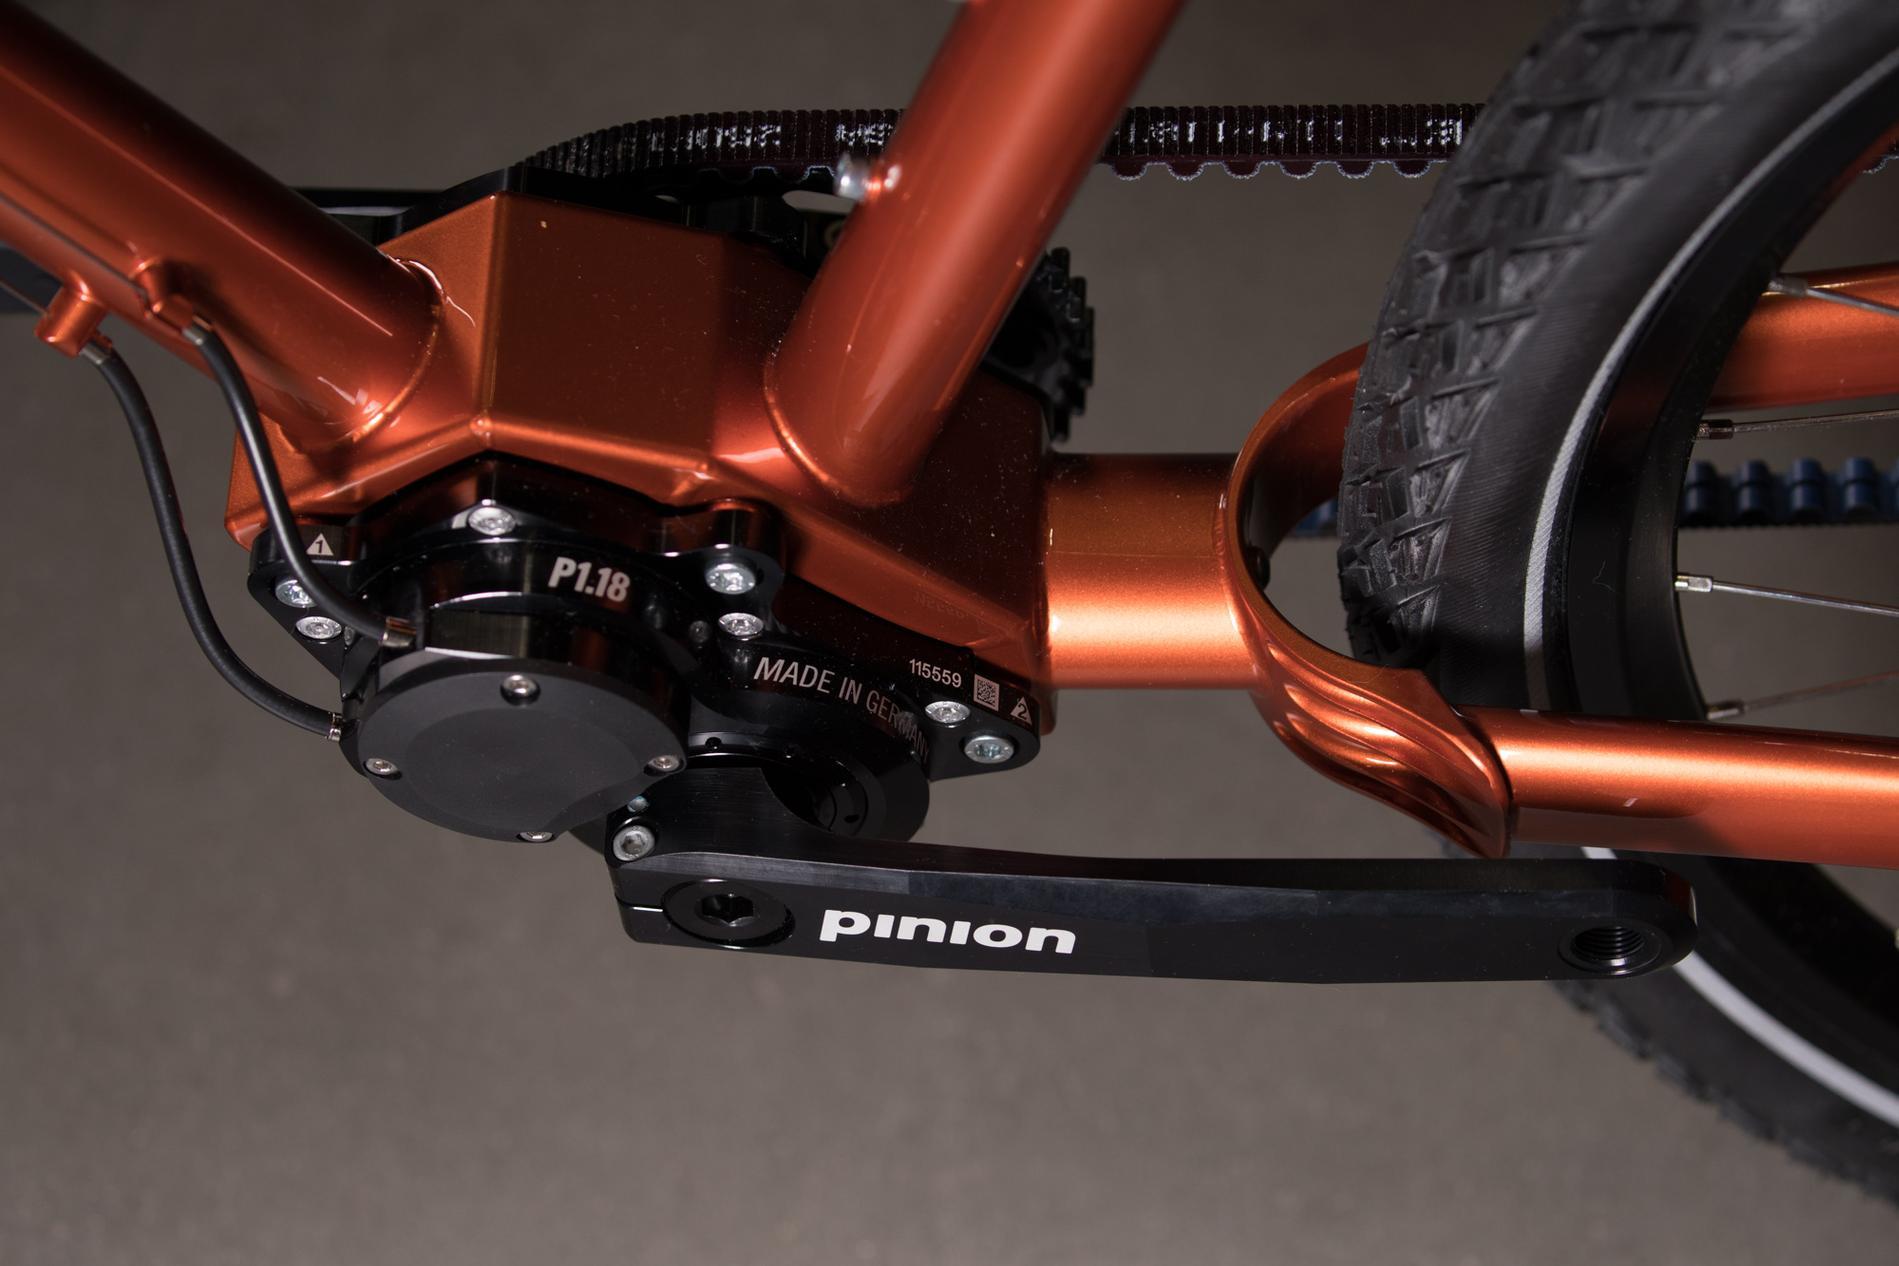 2018 NAHBS: Sunset Fade Co-Motion Pangea with Pinion Touring Bike